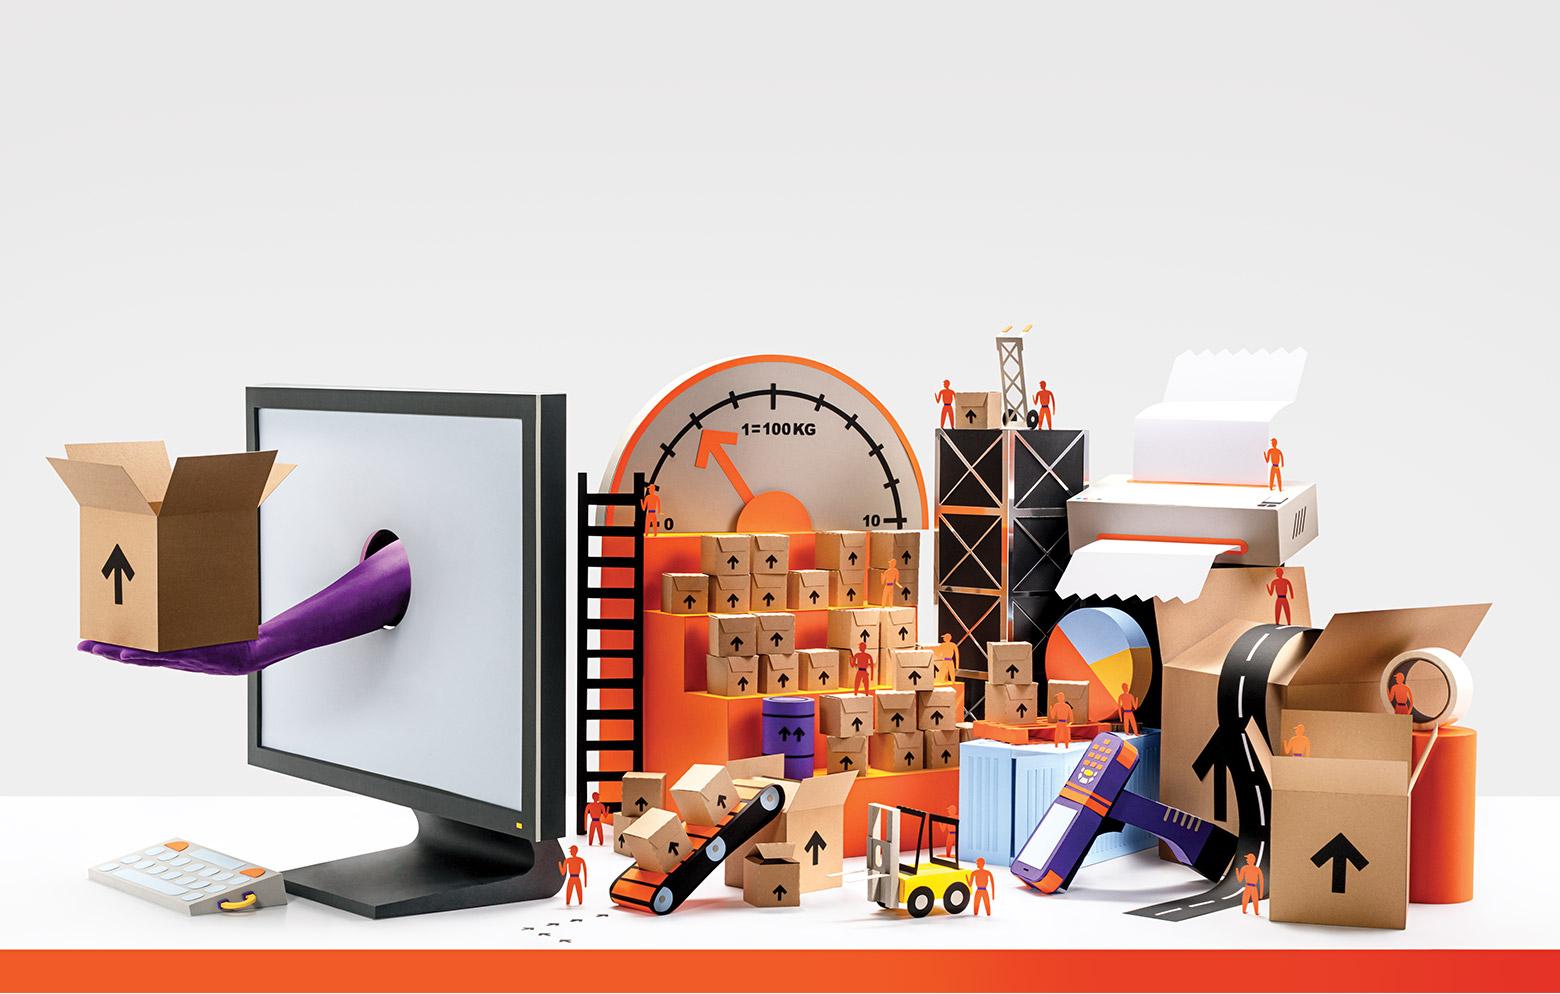 Luminous Design Group Creates Playful Brand Identity for Logika